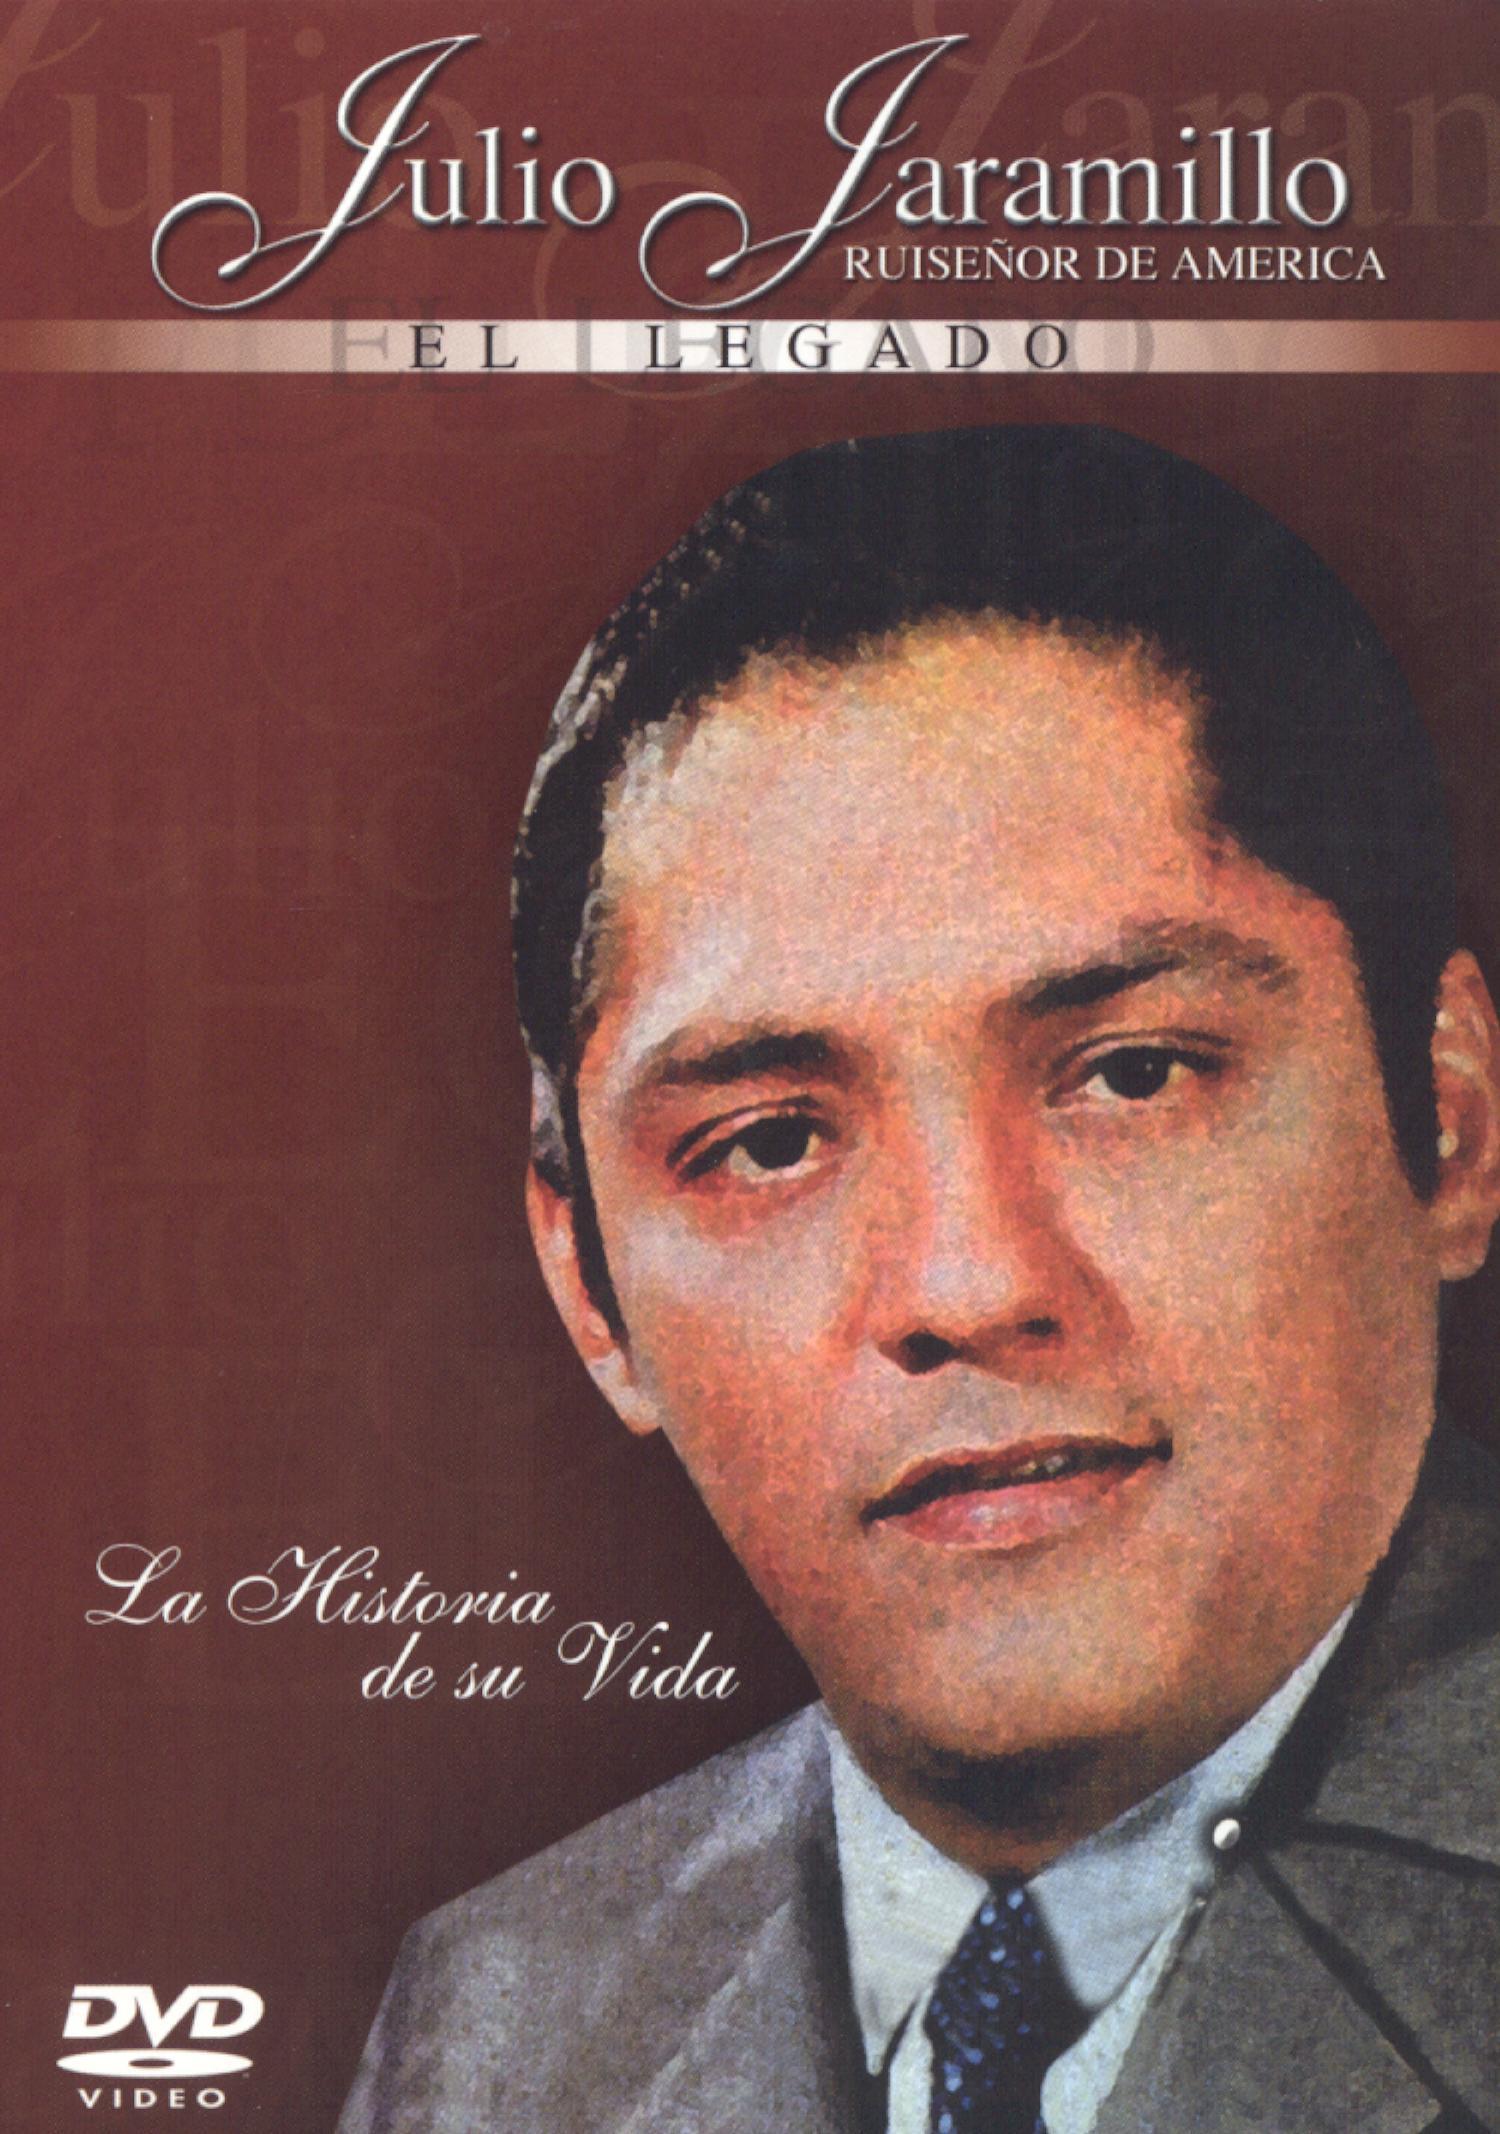 Julio Jaramillo: El Legado